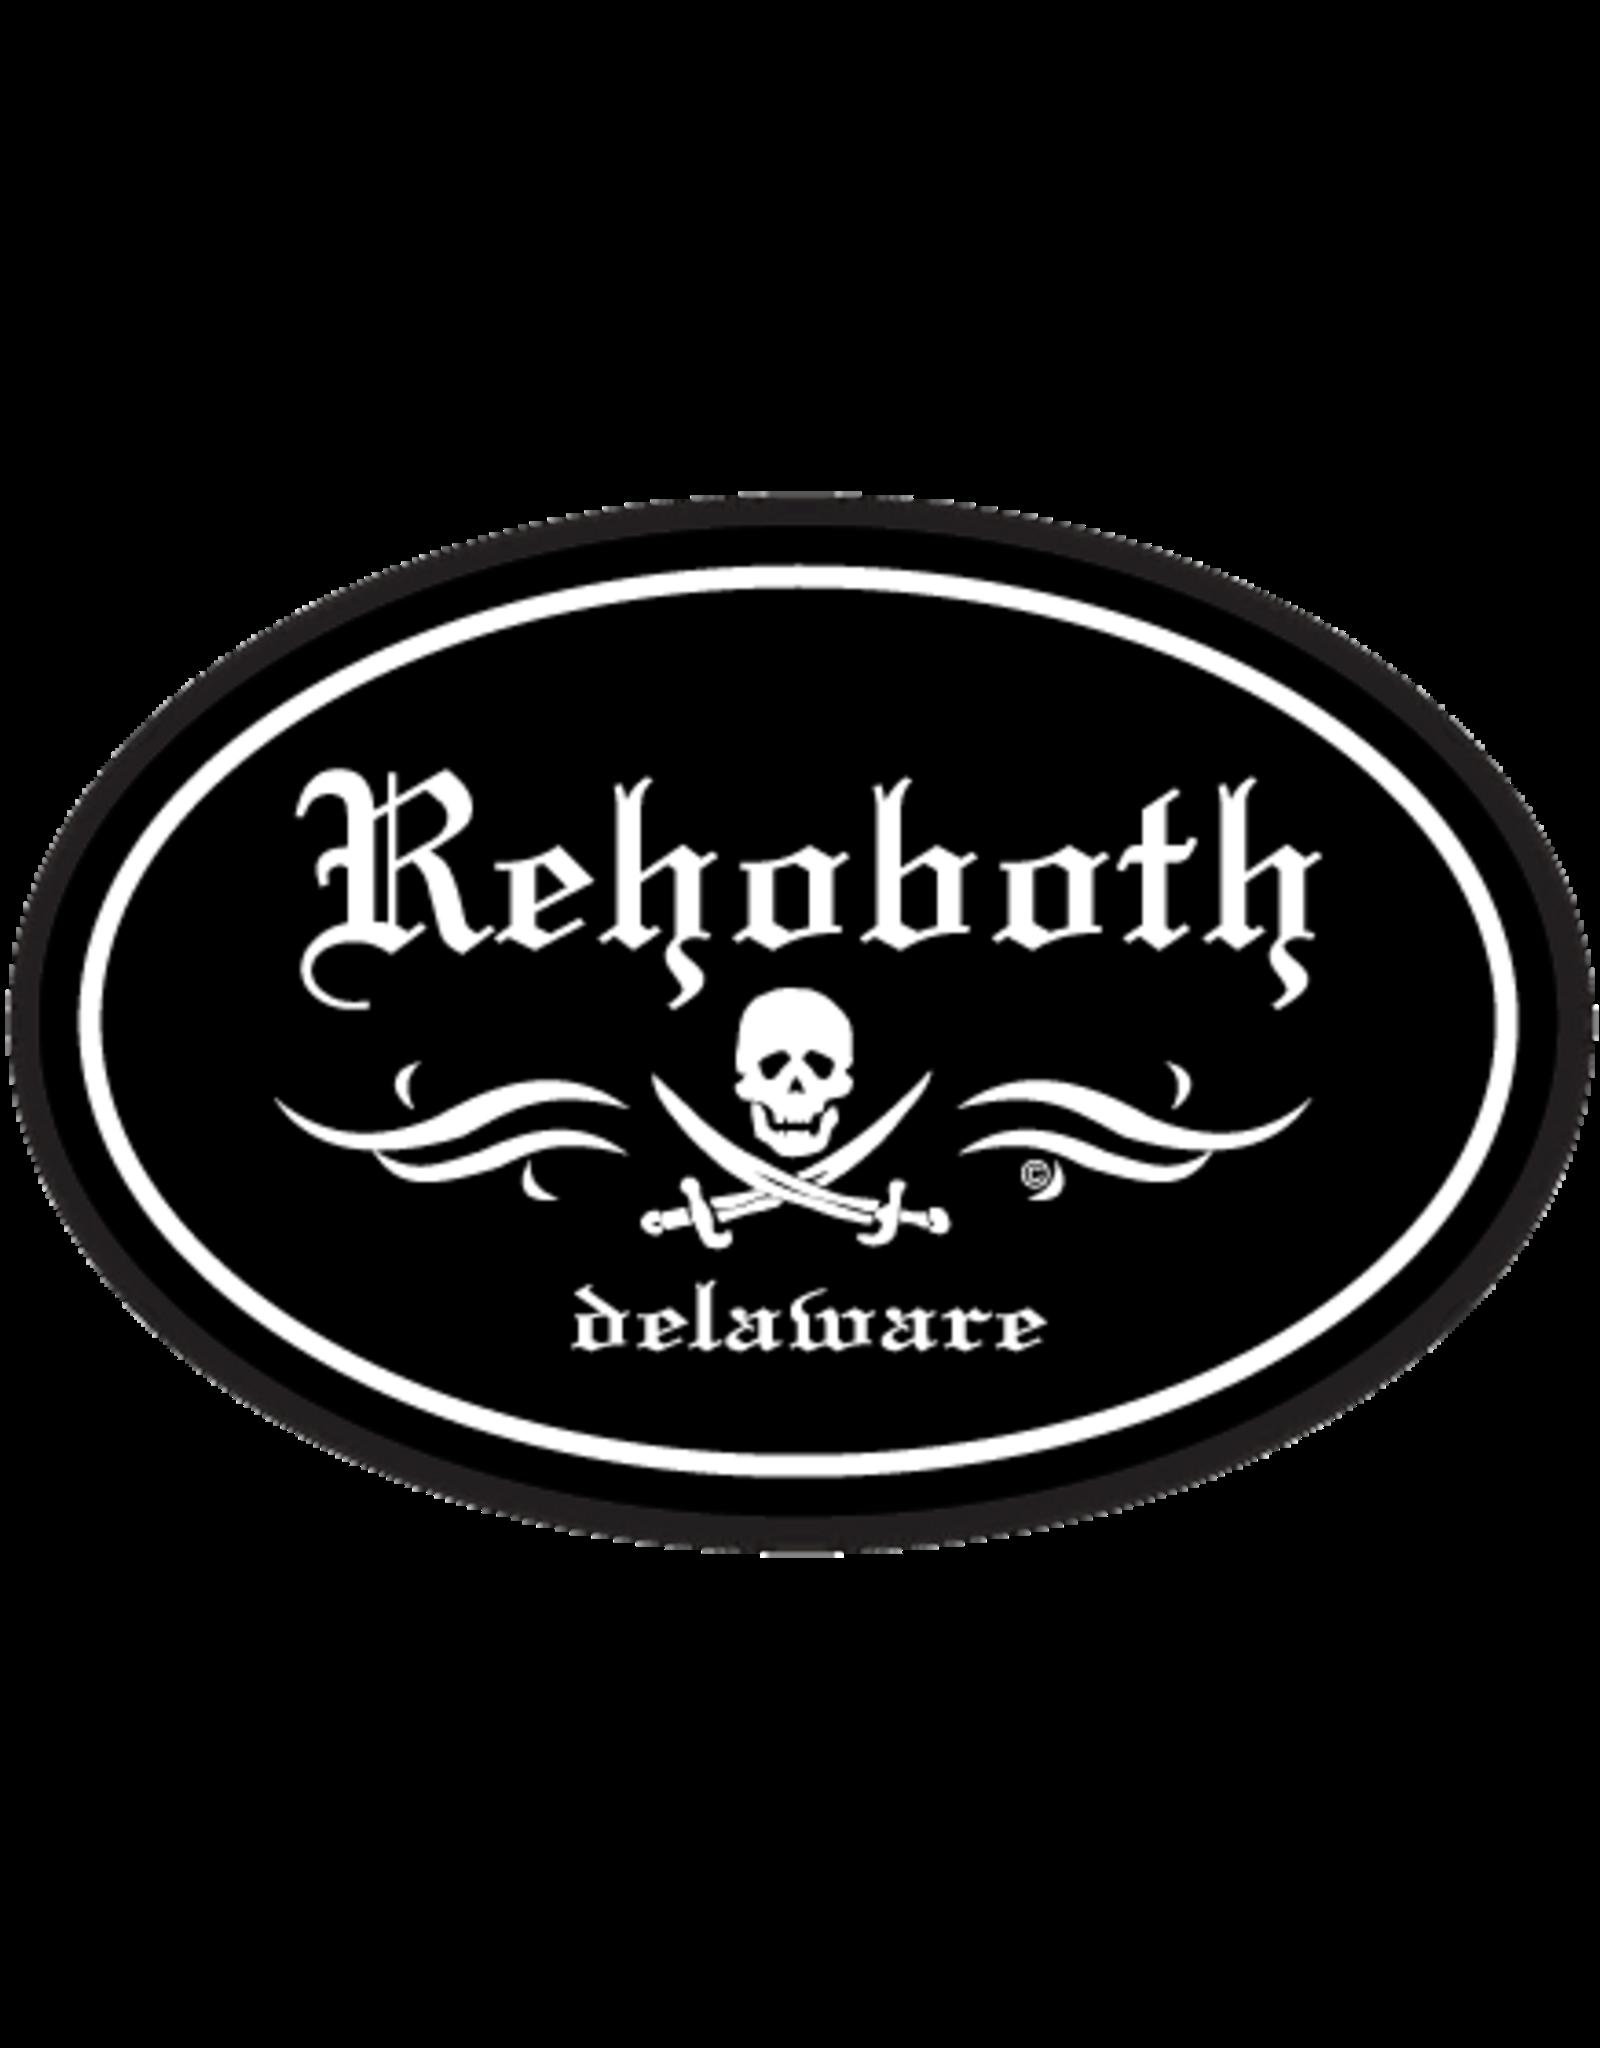 REHOBOTH LIFESTYLE EURO STICKER 5.75 x 3.875 OVAL REHOBOTH PIRATE BLACK